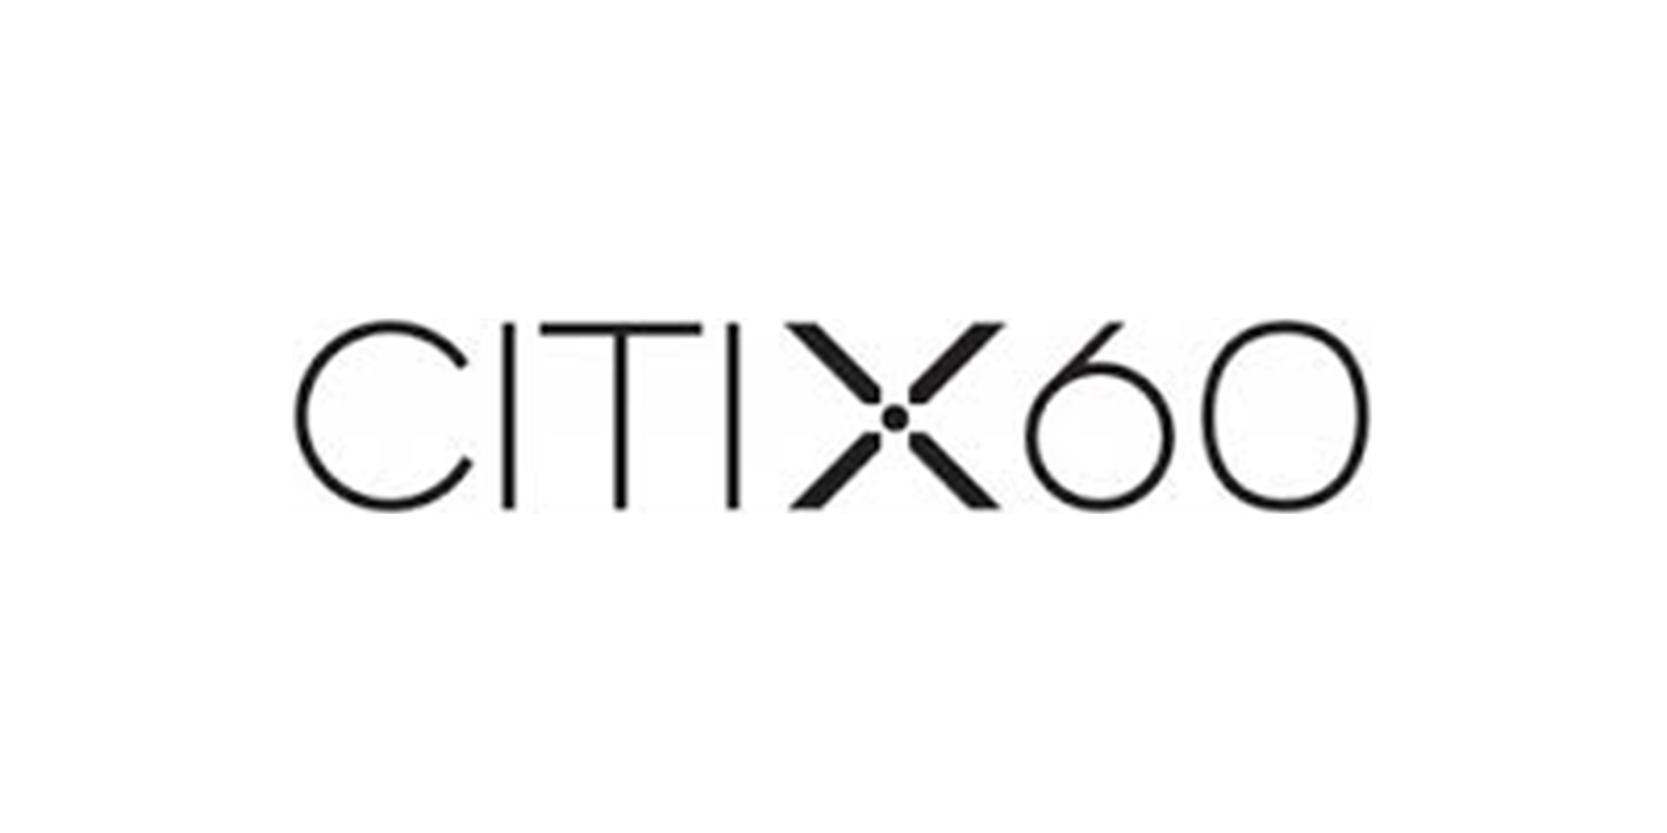 CITIX60